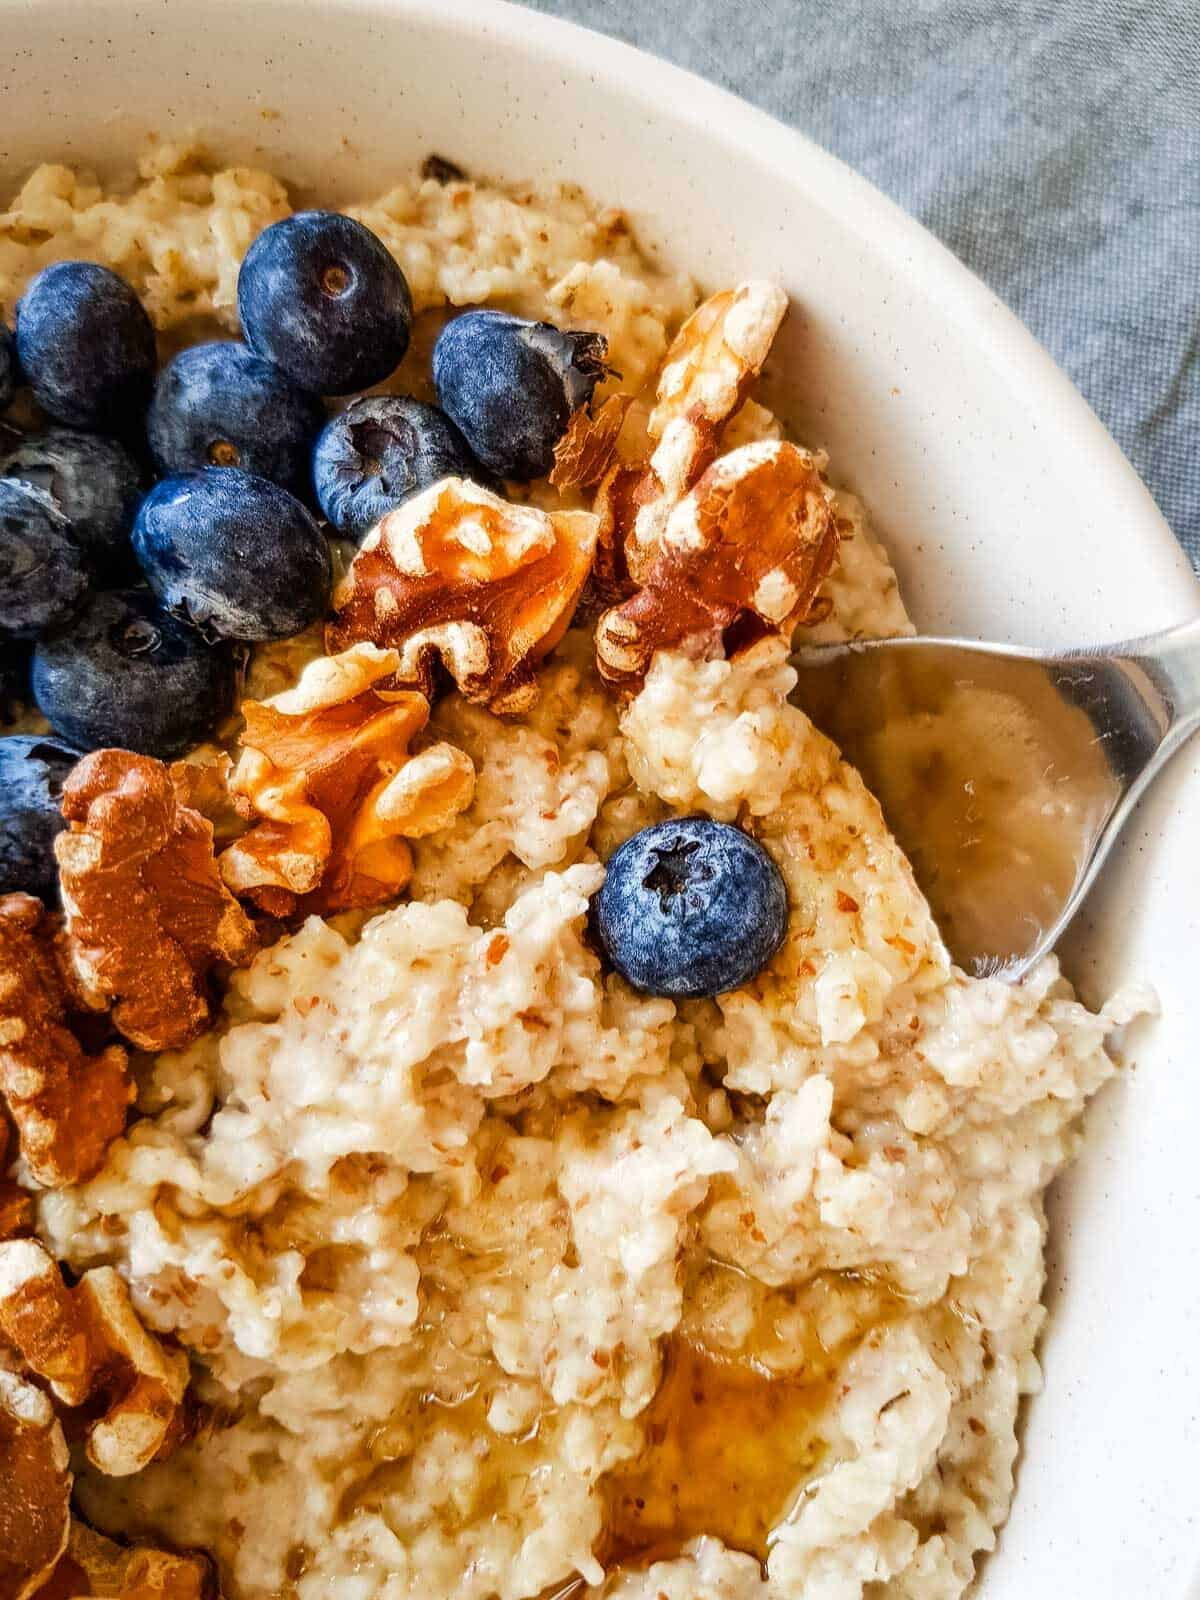 A spoonful of oatmeal.